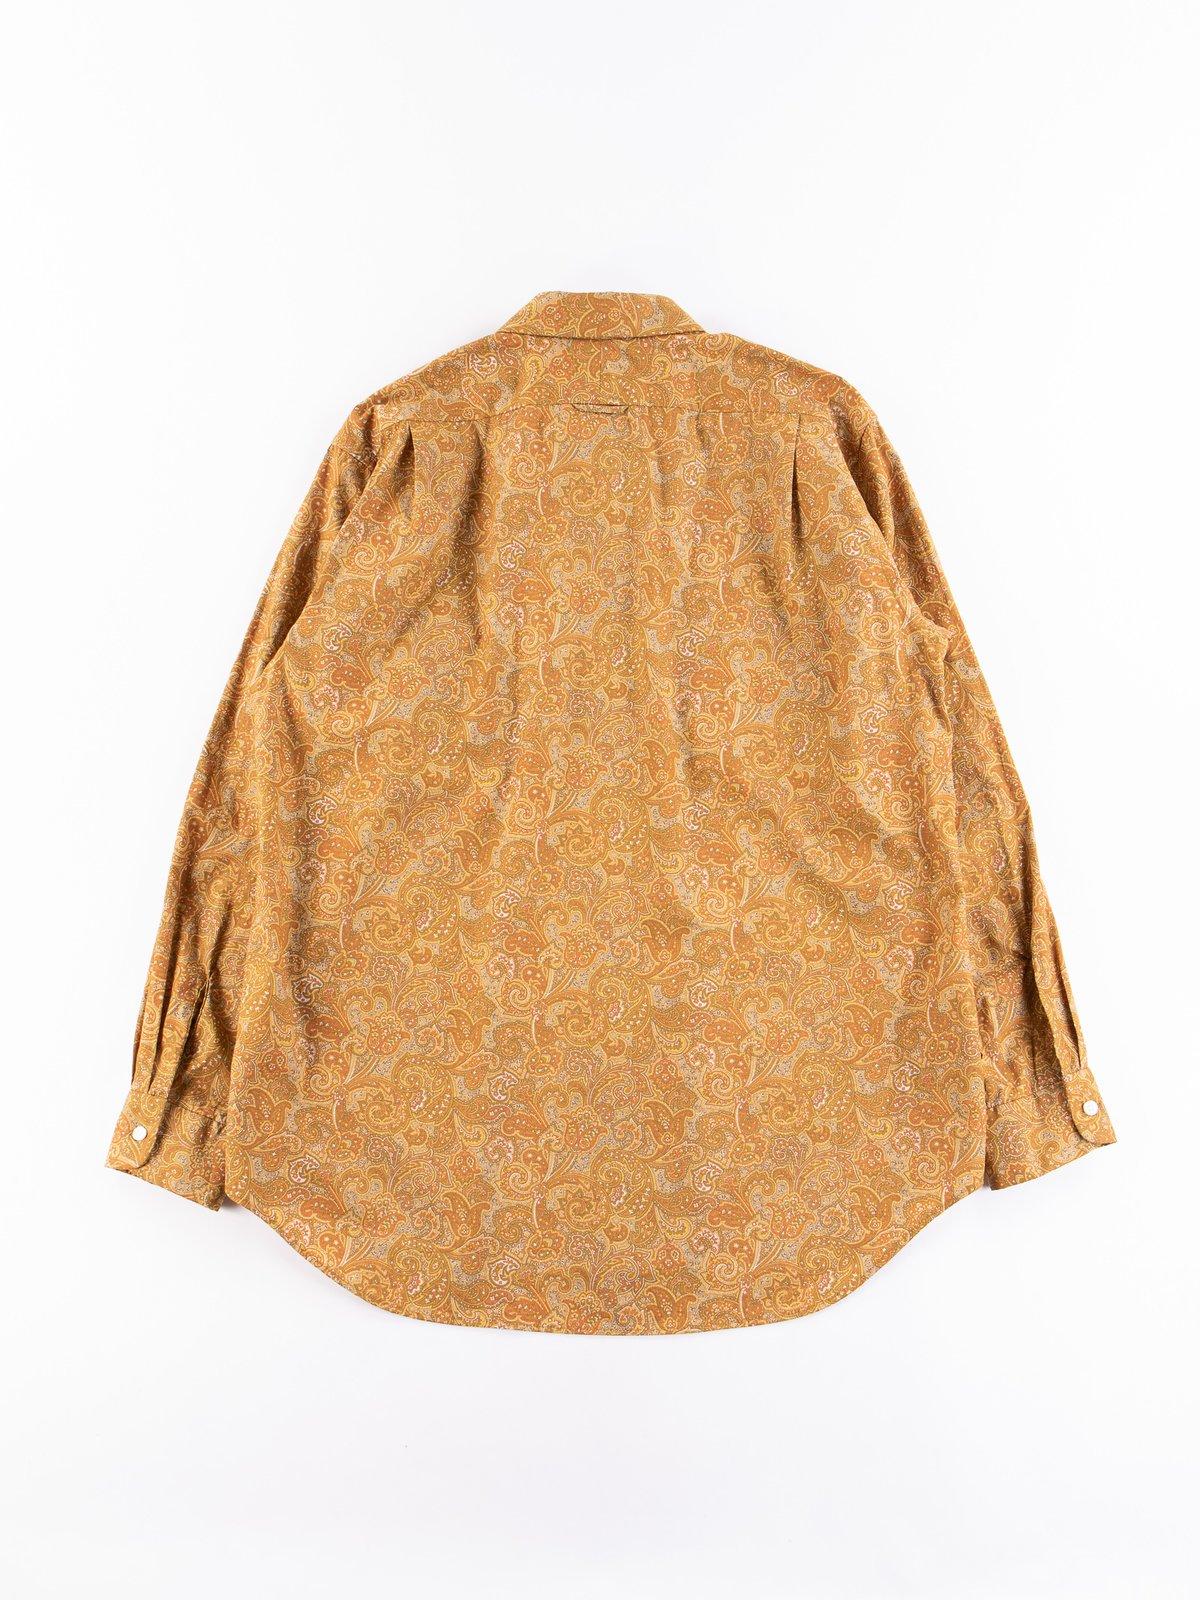 Tan/Olive Cotton Paisley Print Short Collar Shirt - Image 5